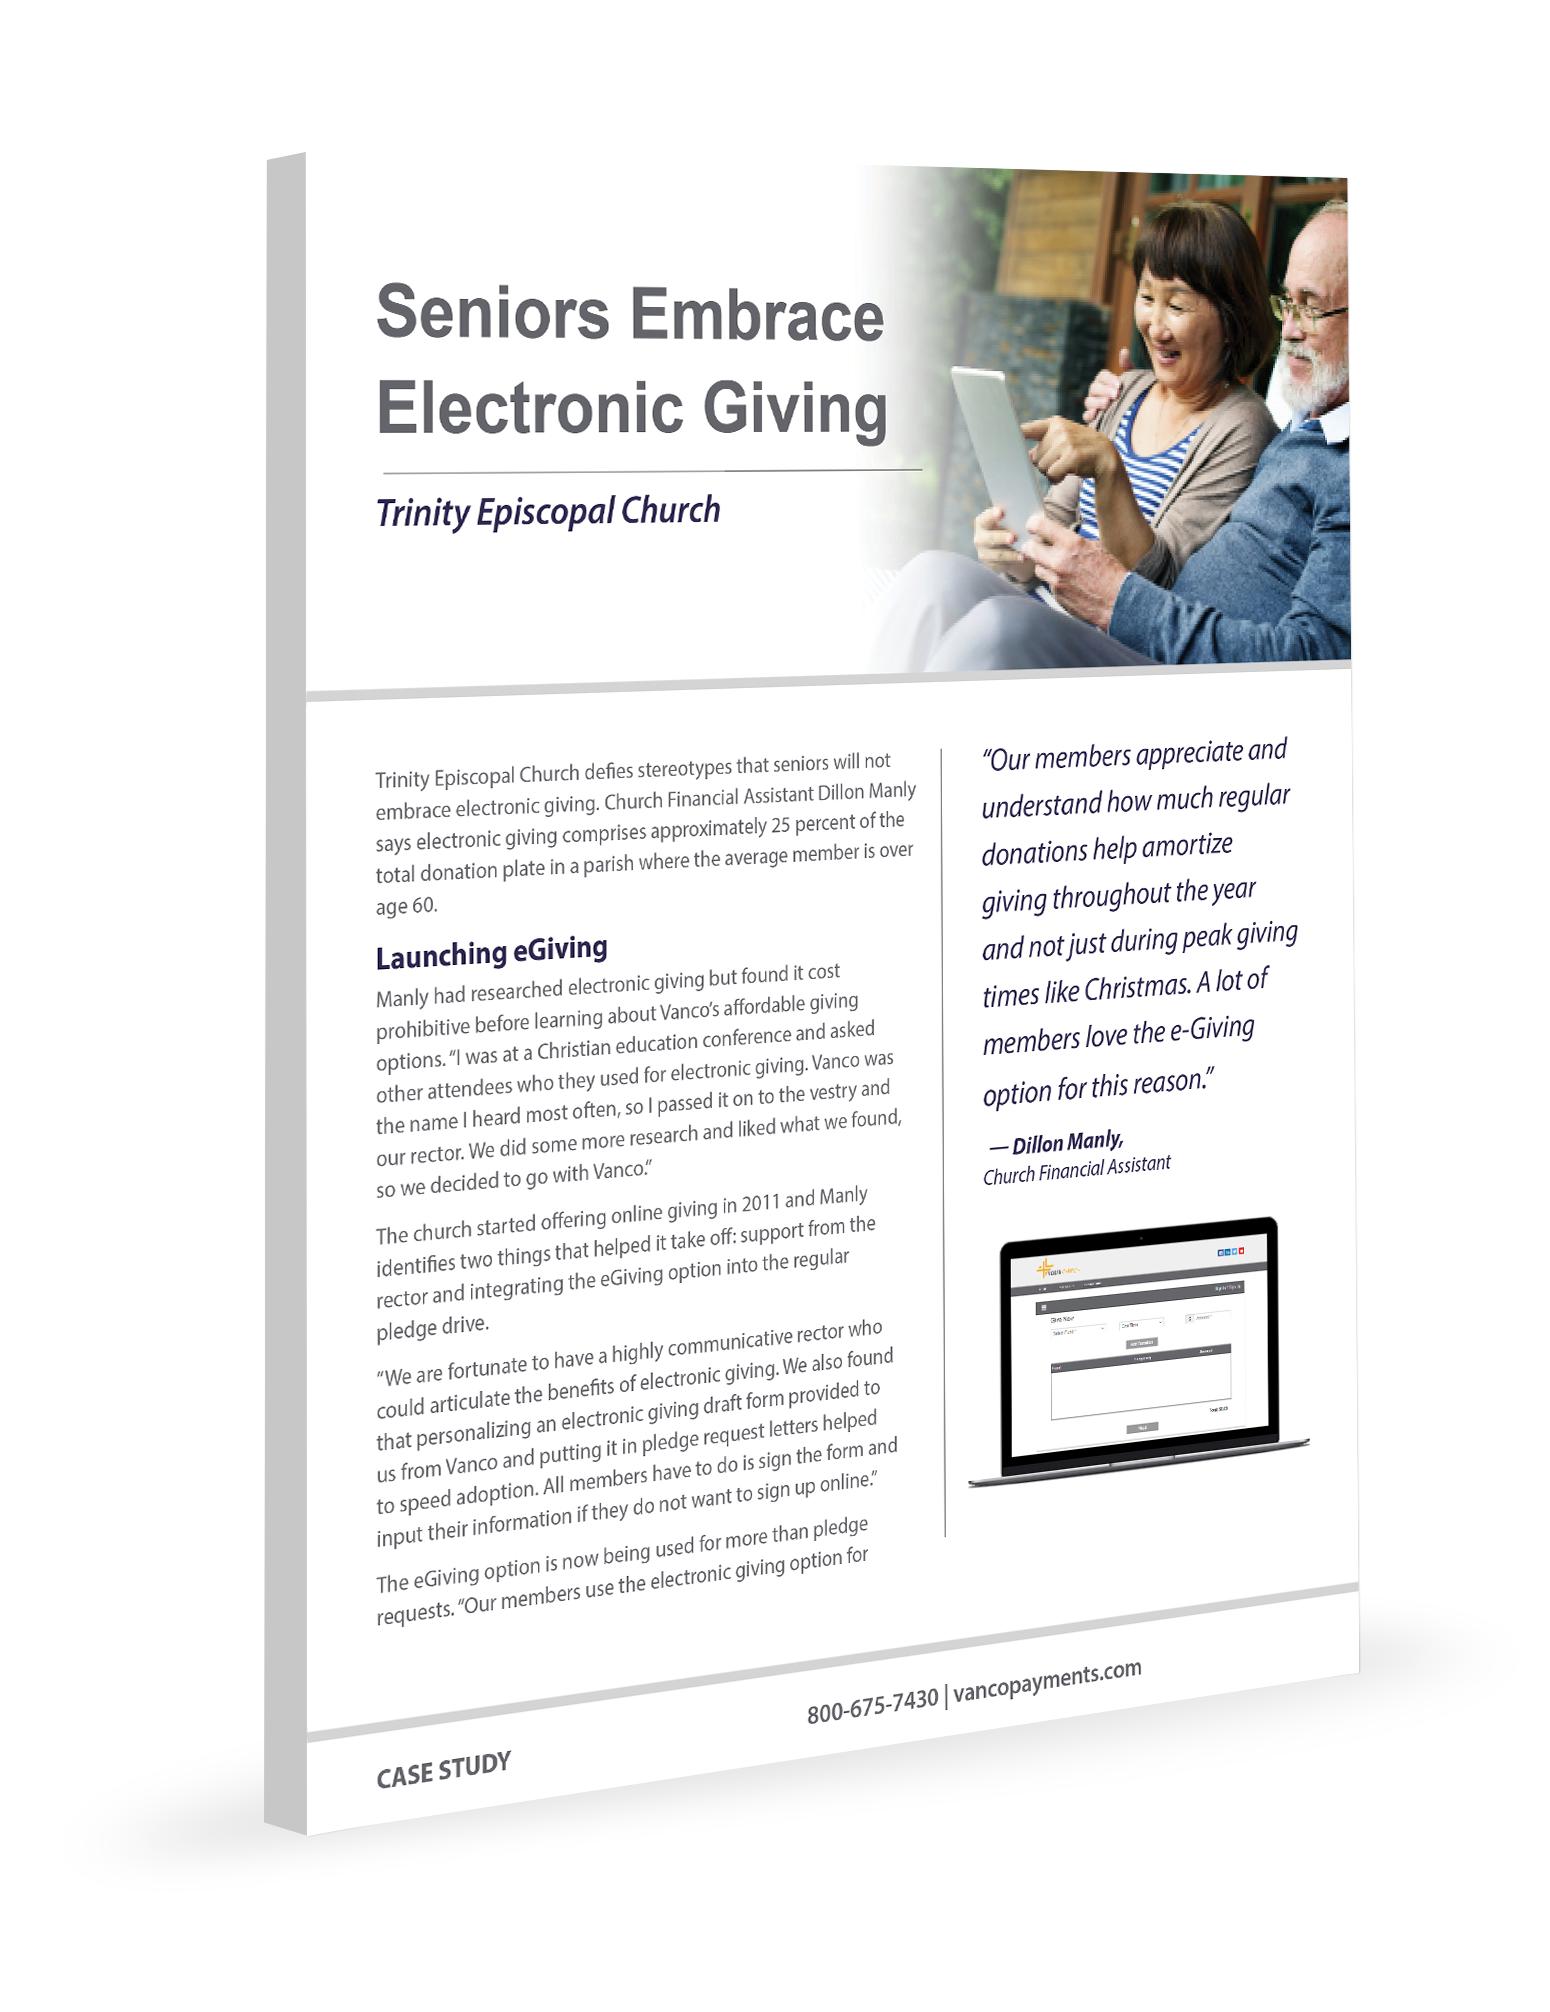 Case Study_Seniors and eGiving